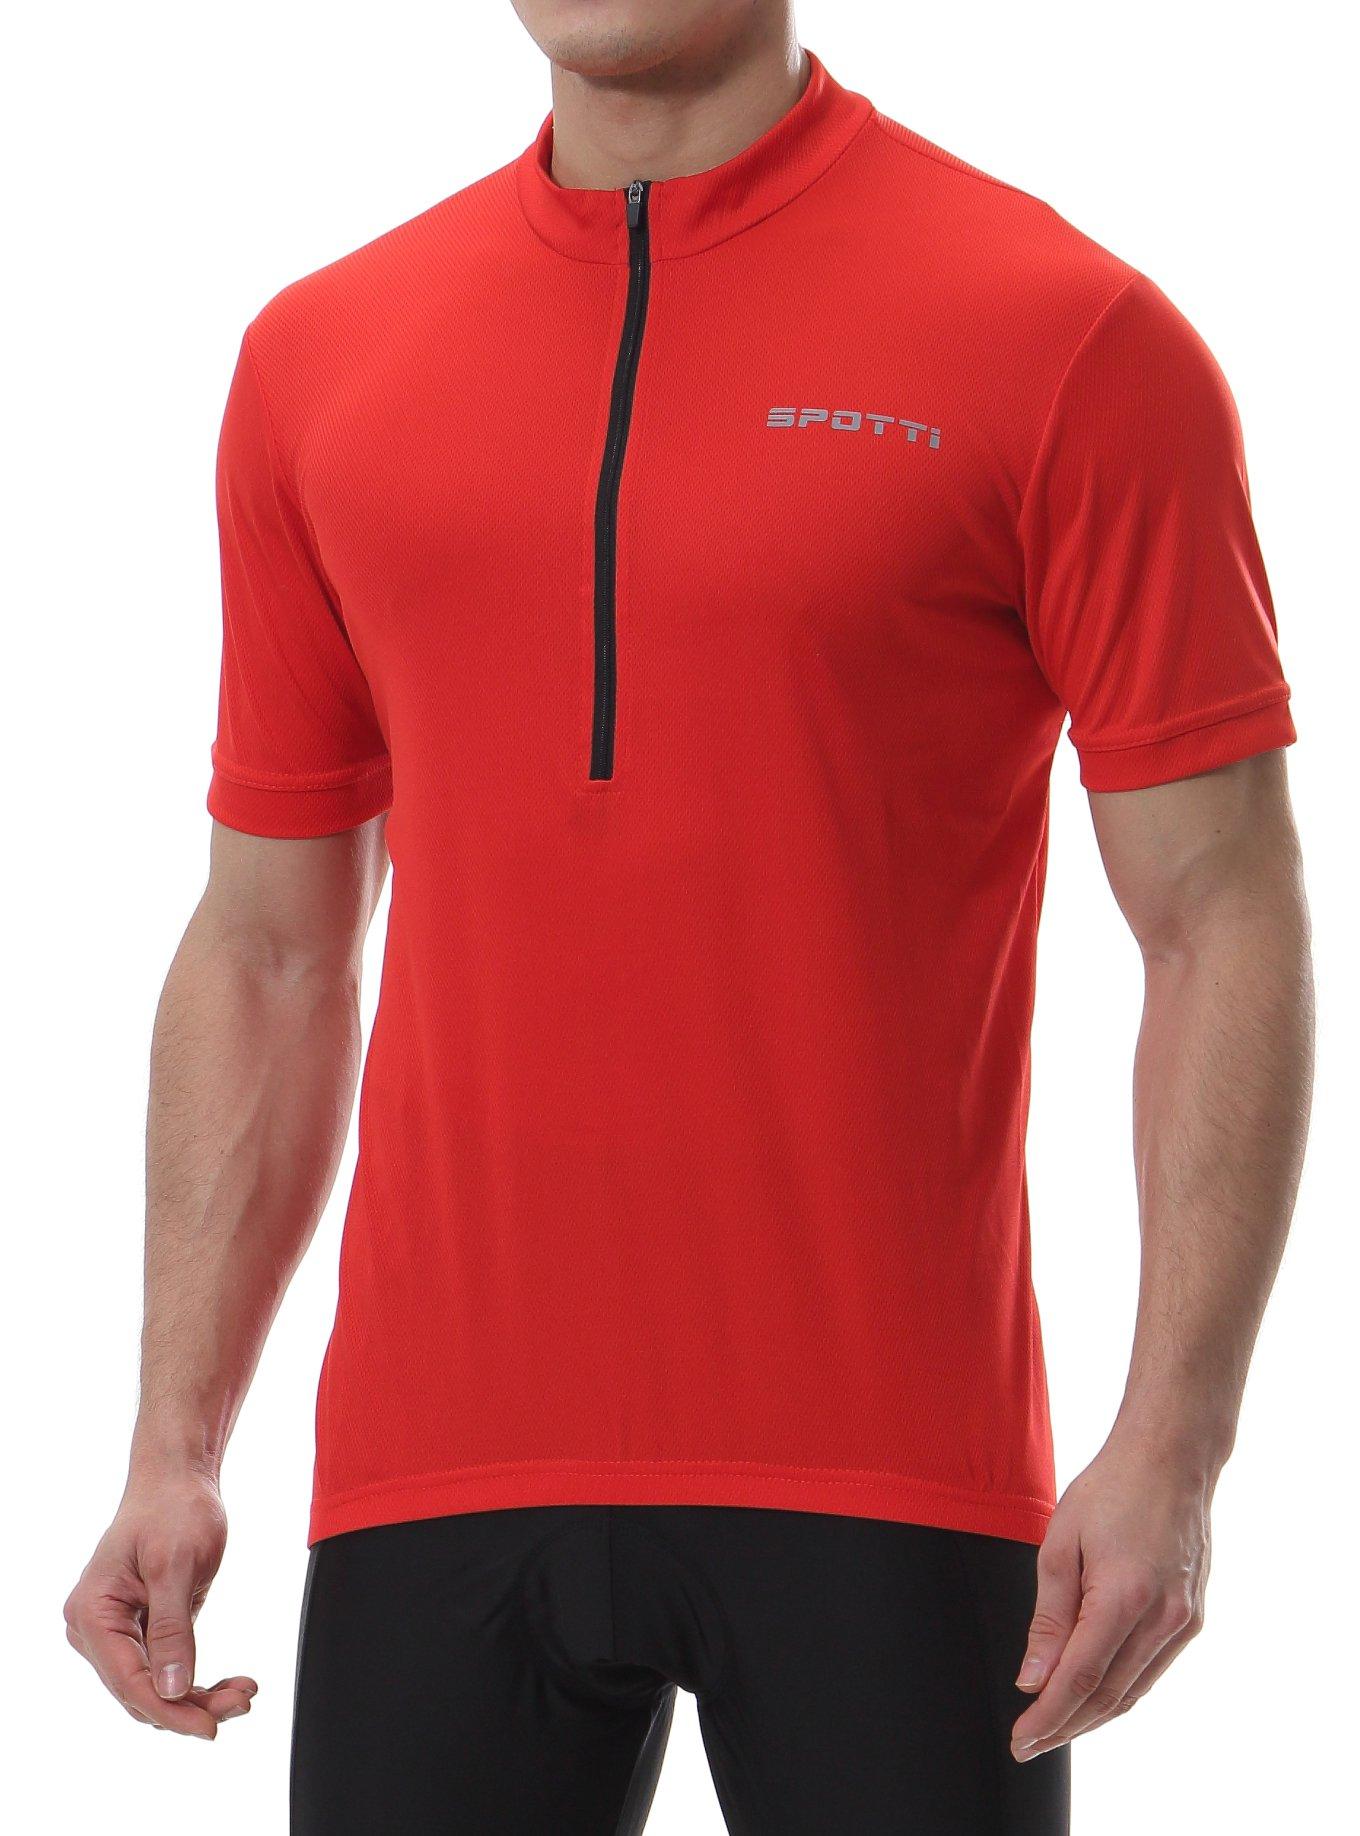 e00e01055562 Spotti Men s Cycling Bike Jersey Short Sleeve with 3 Rear Pockets- Moisture  Wicking